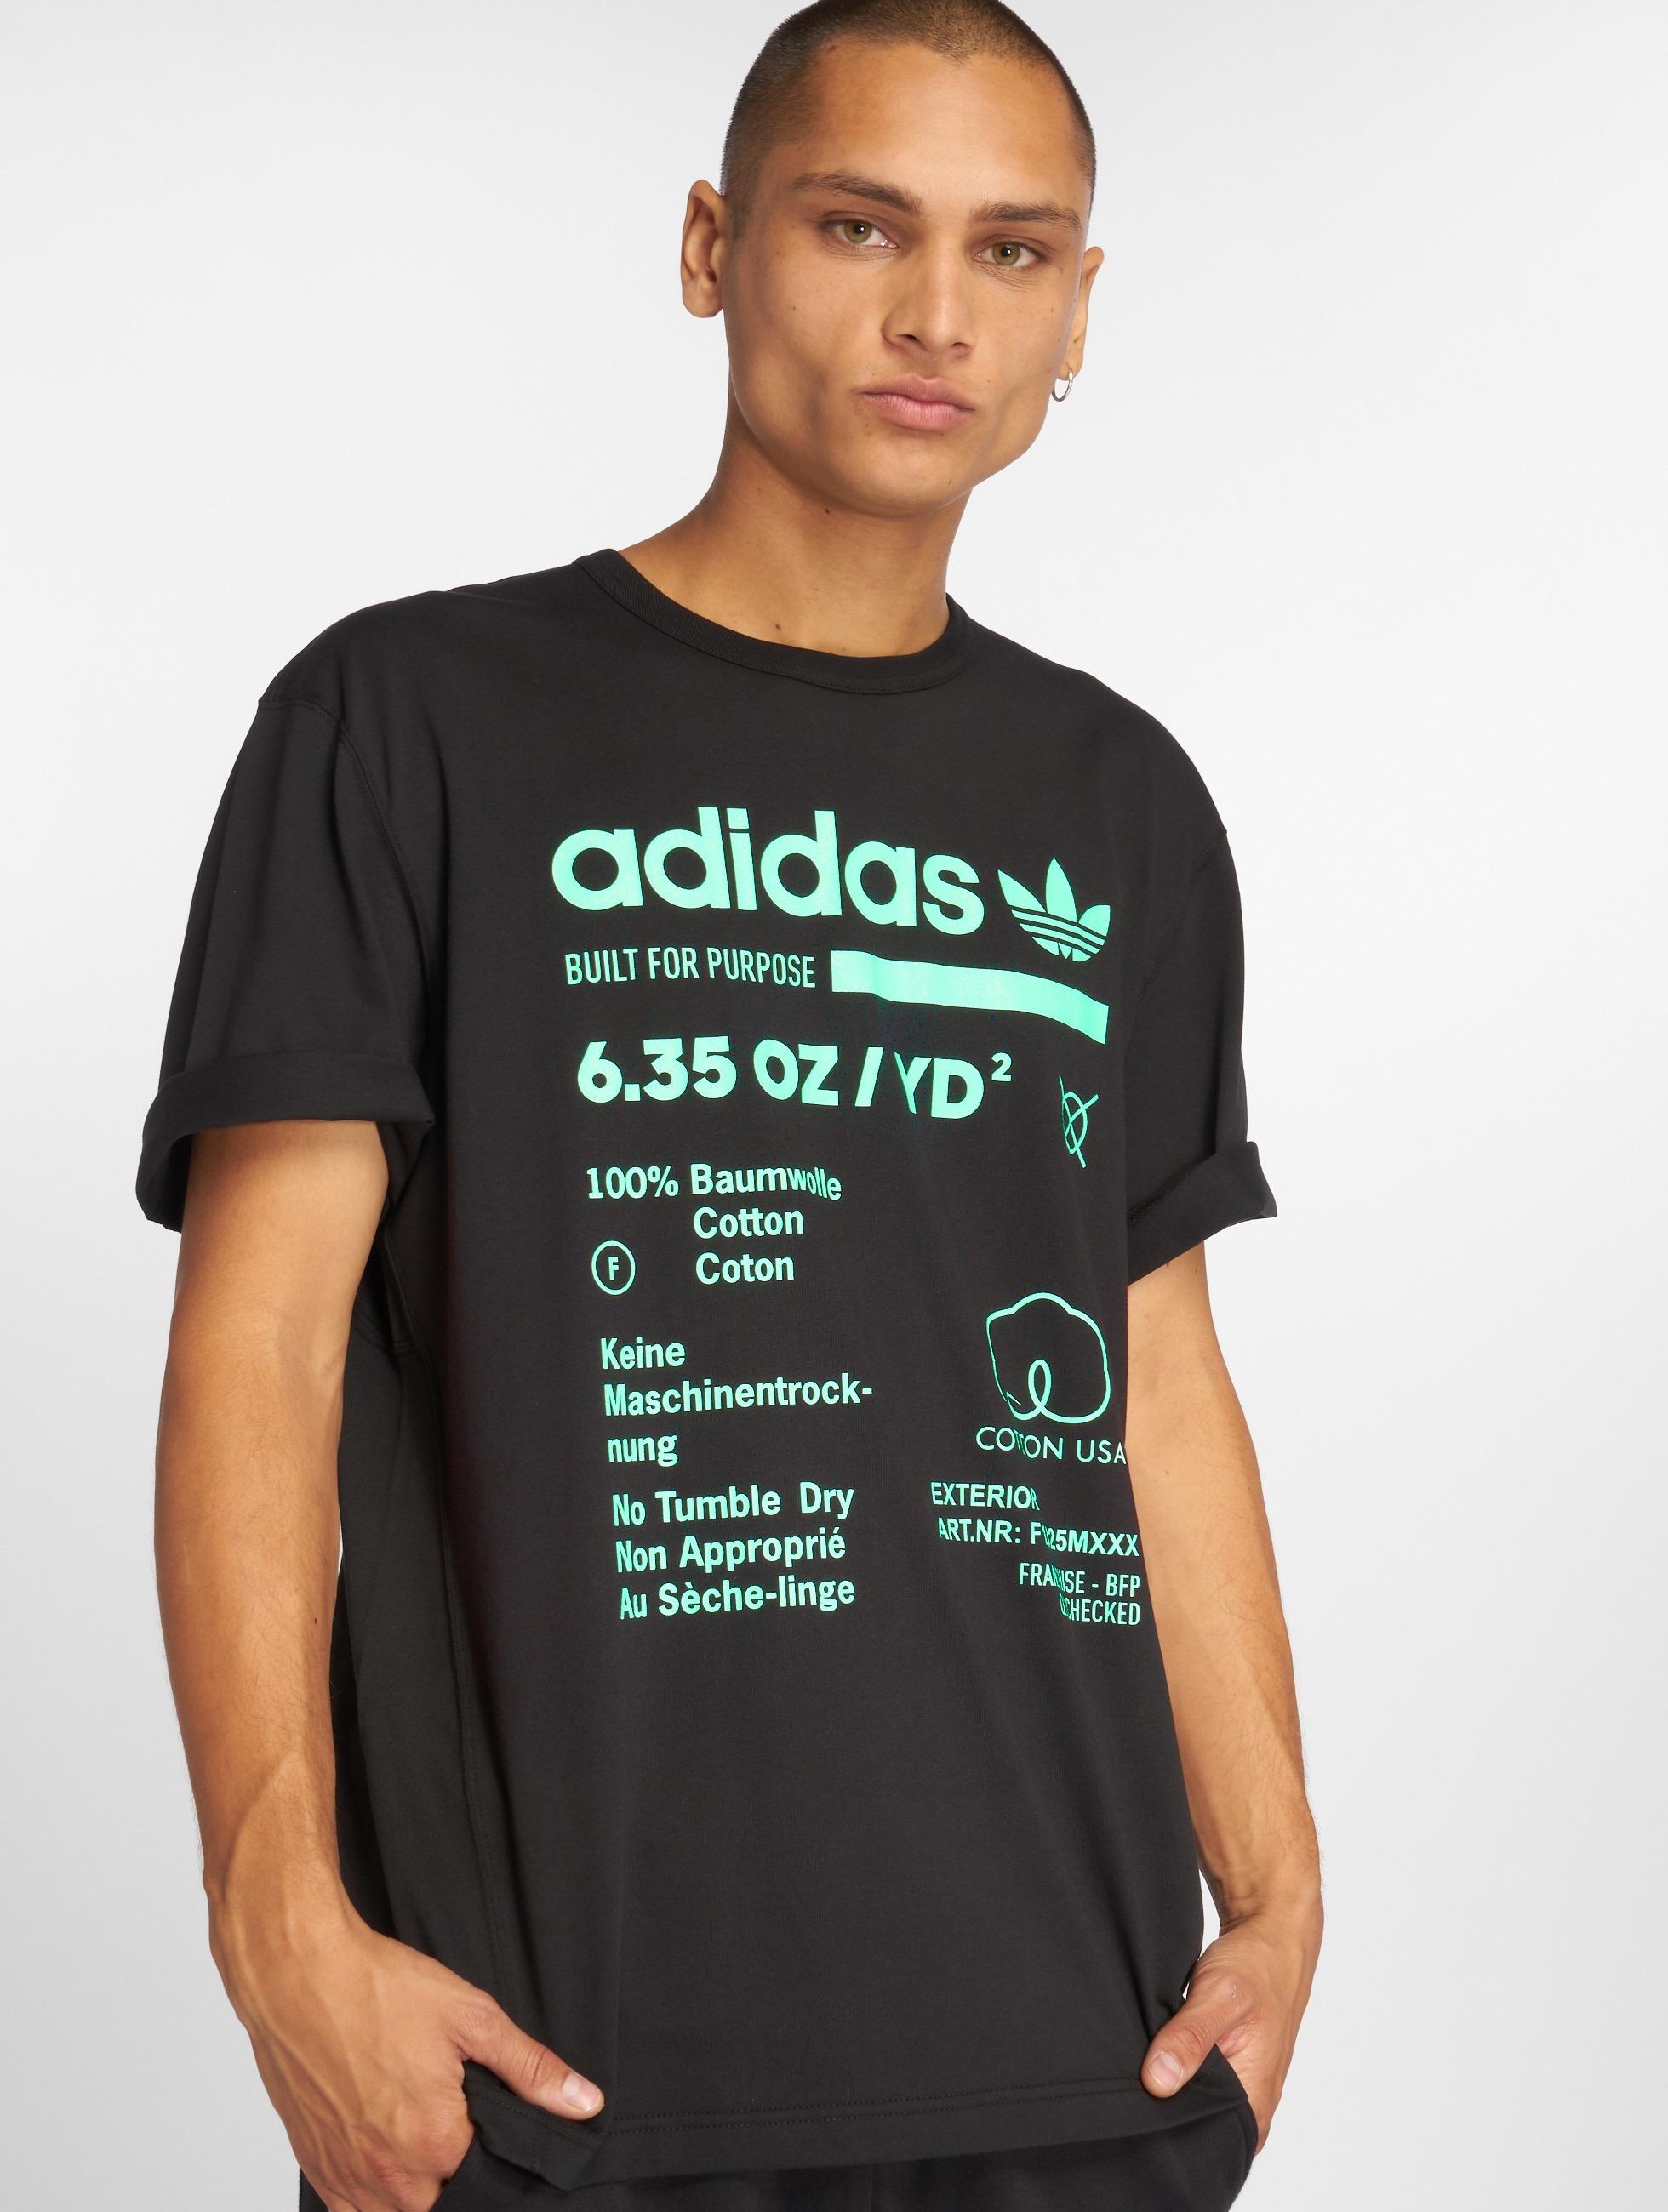 ADIDAS Originals Kaval Grp Navy Blue Round Neck T Shirt